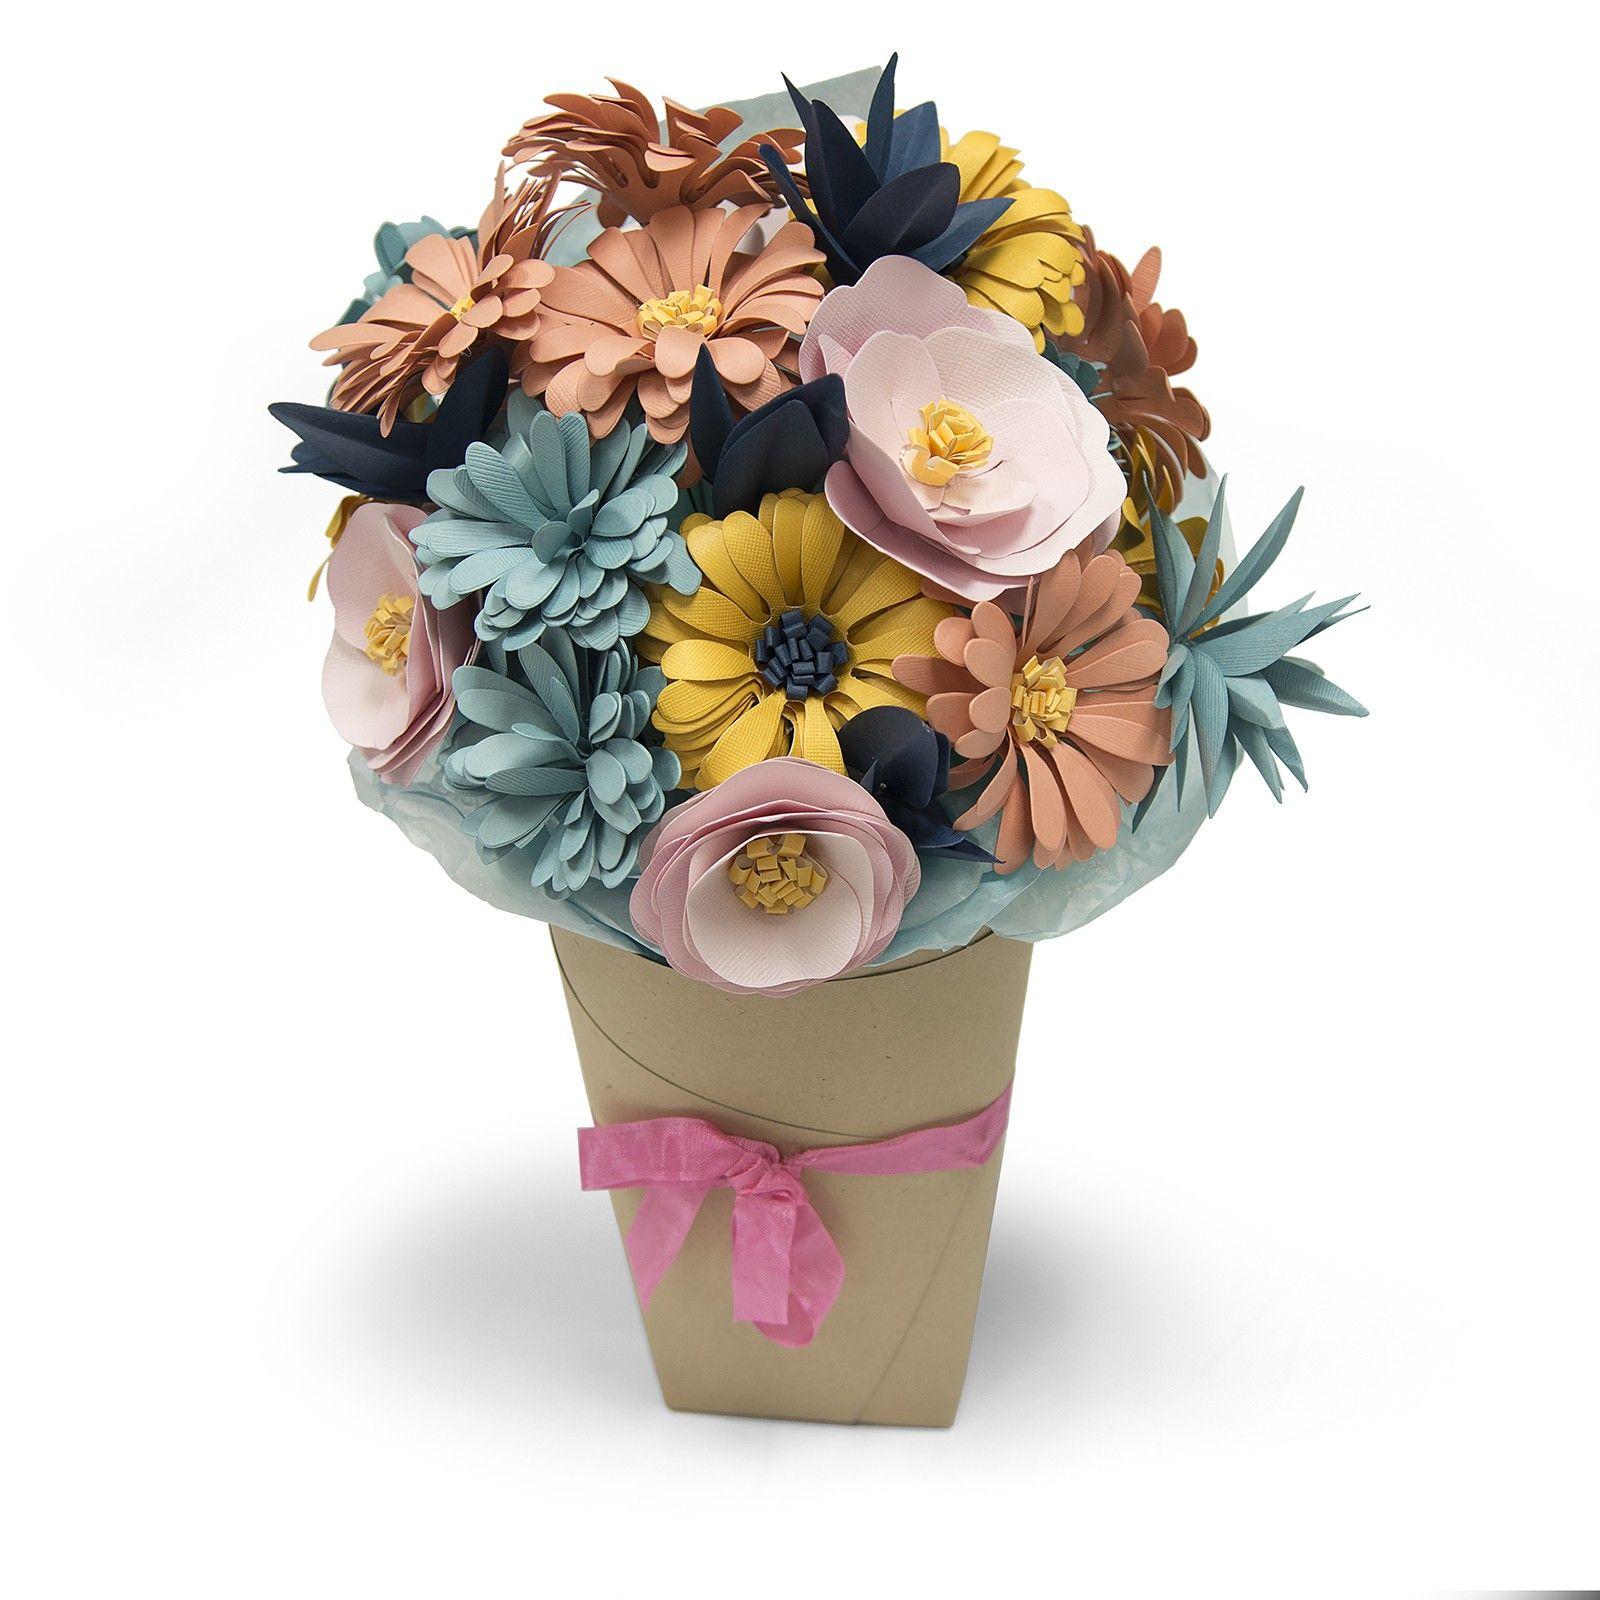 Sizzix Bundle Of Flowers에 대한 이미지 검색결과